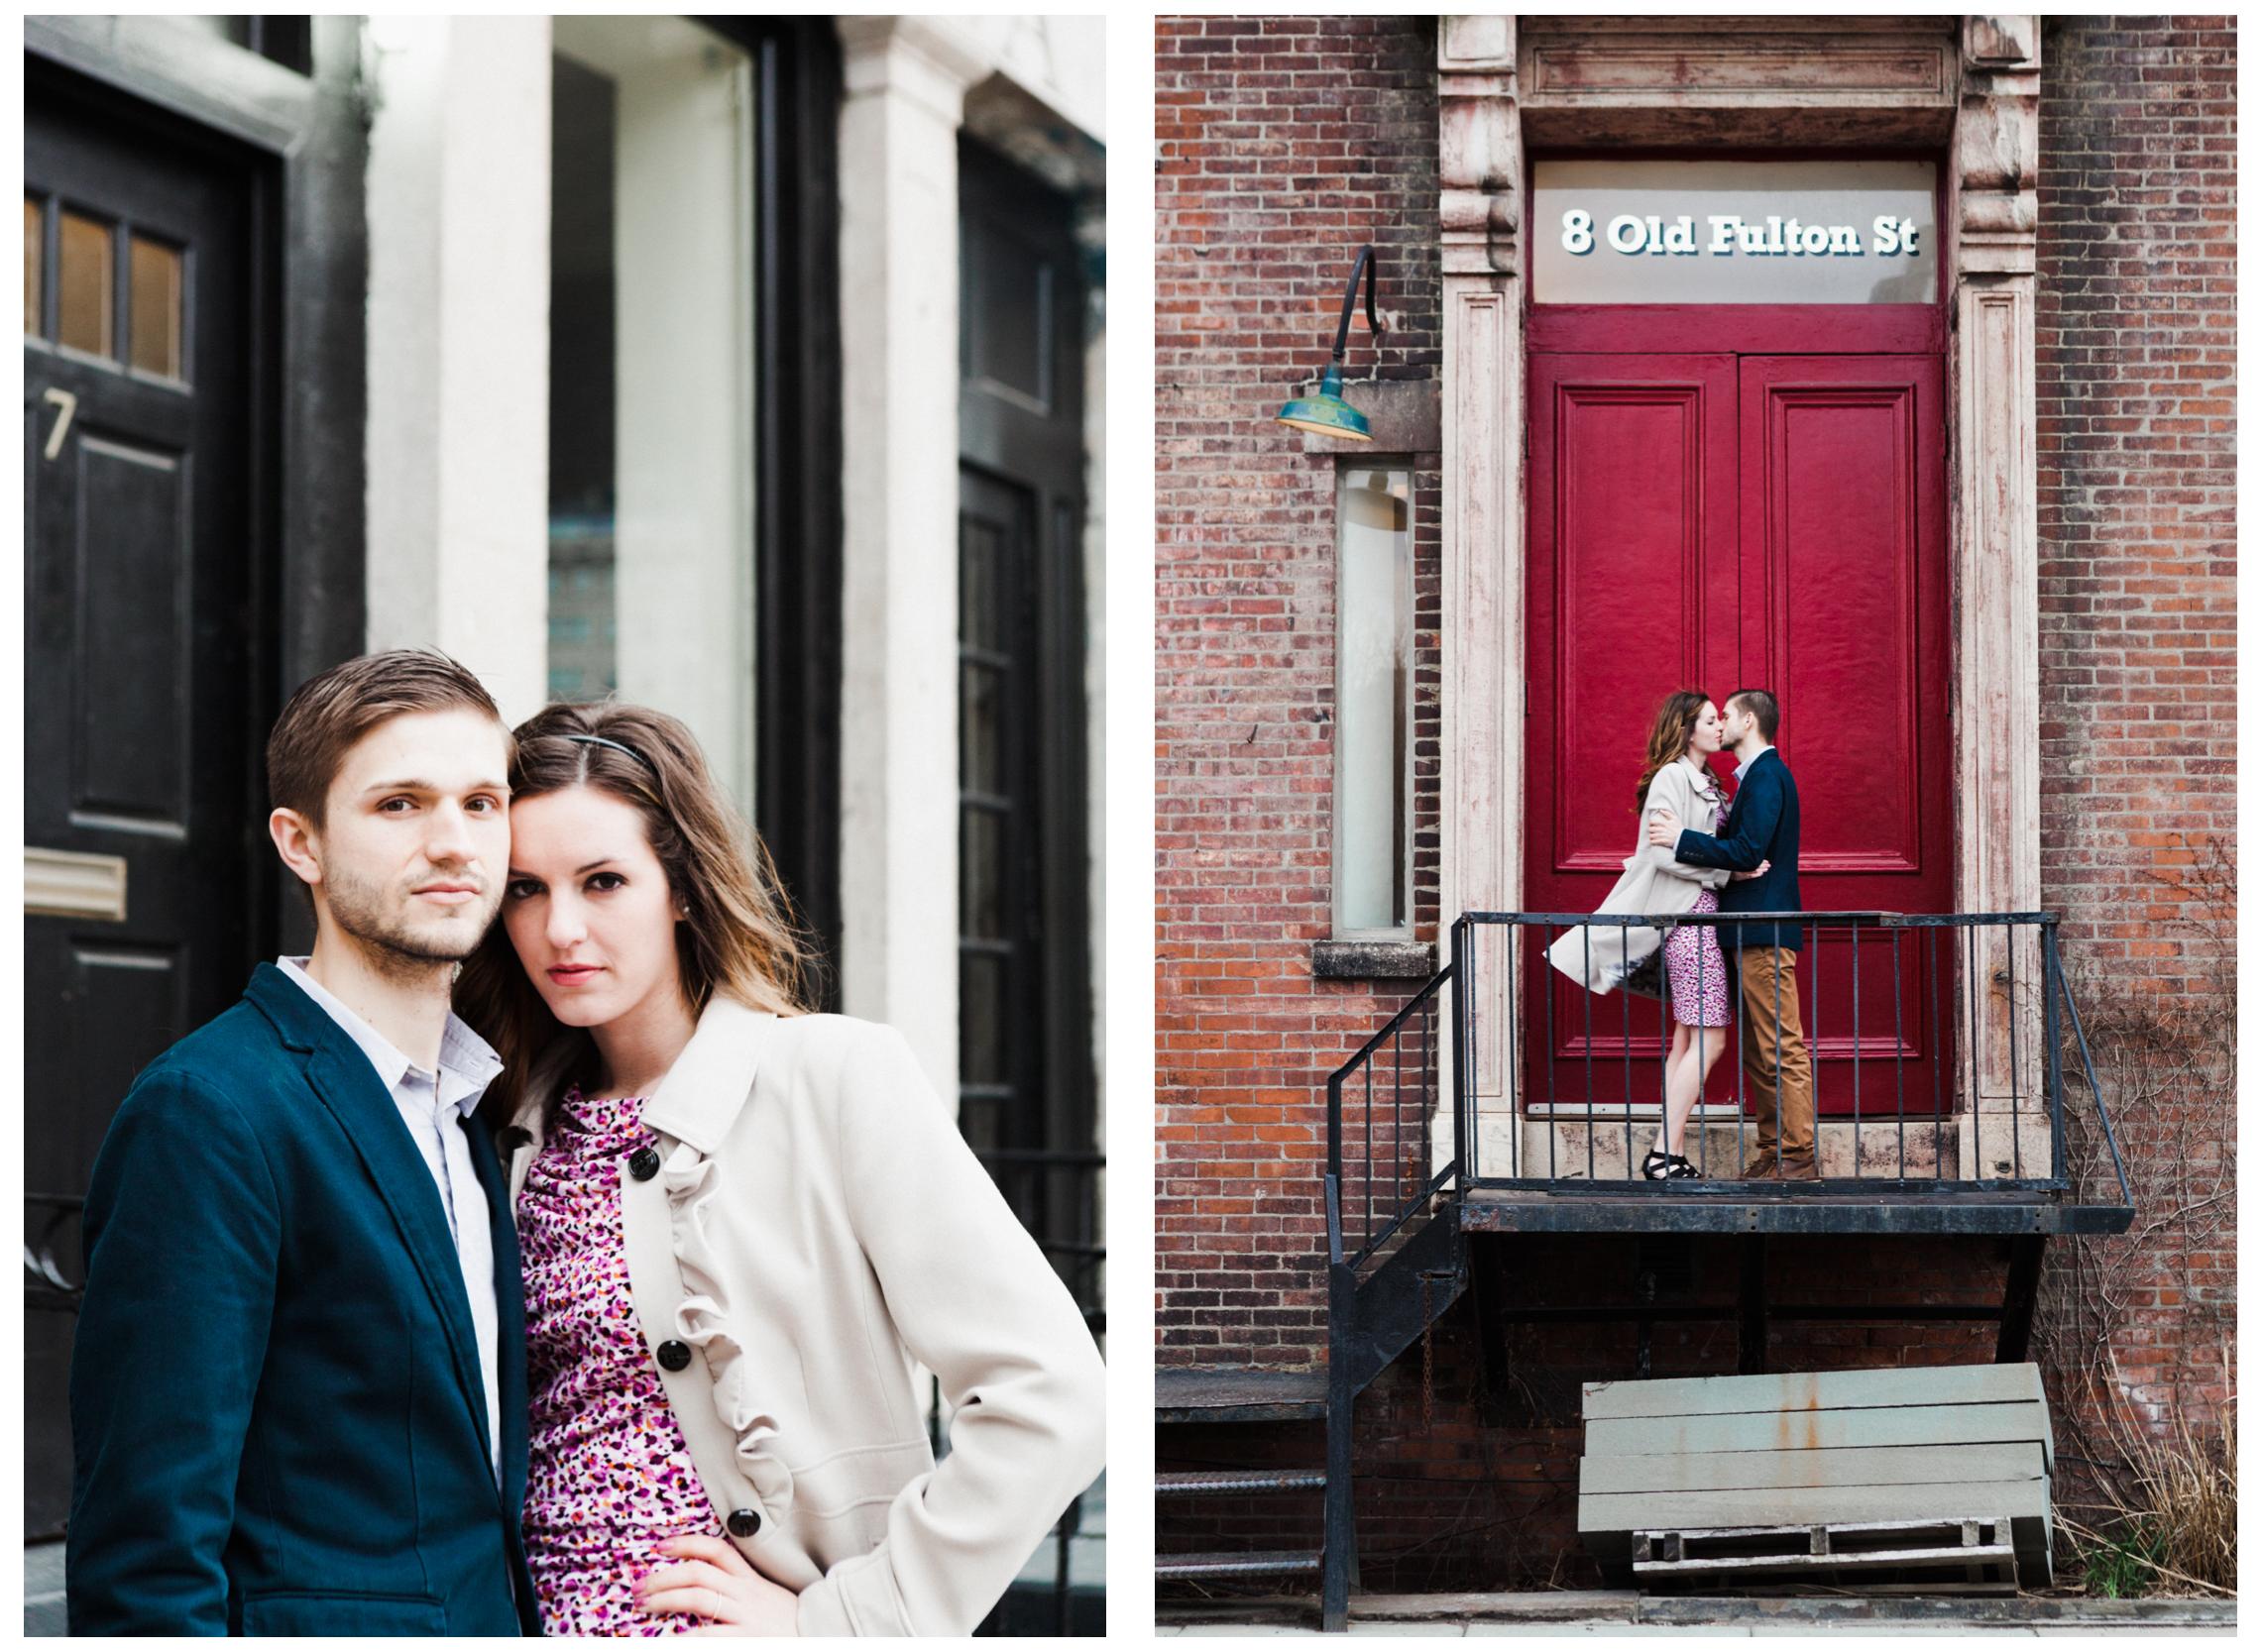 15-Brooklyn-Dumbo-Engagement-Session-Allison-Sullivan.jpg